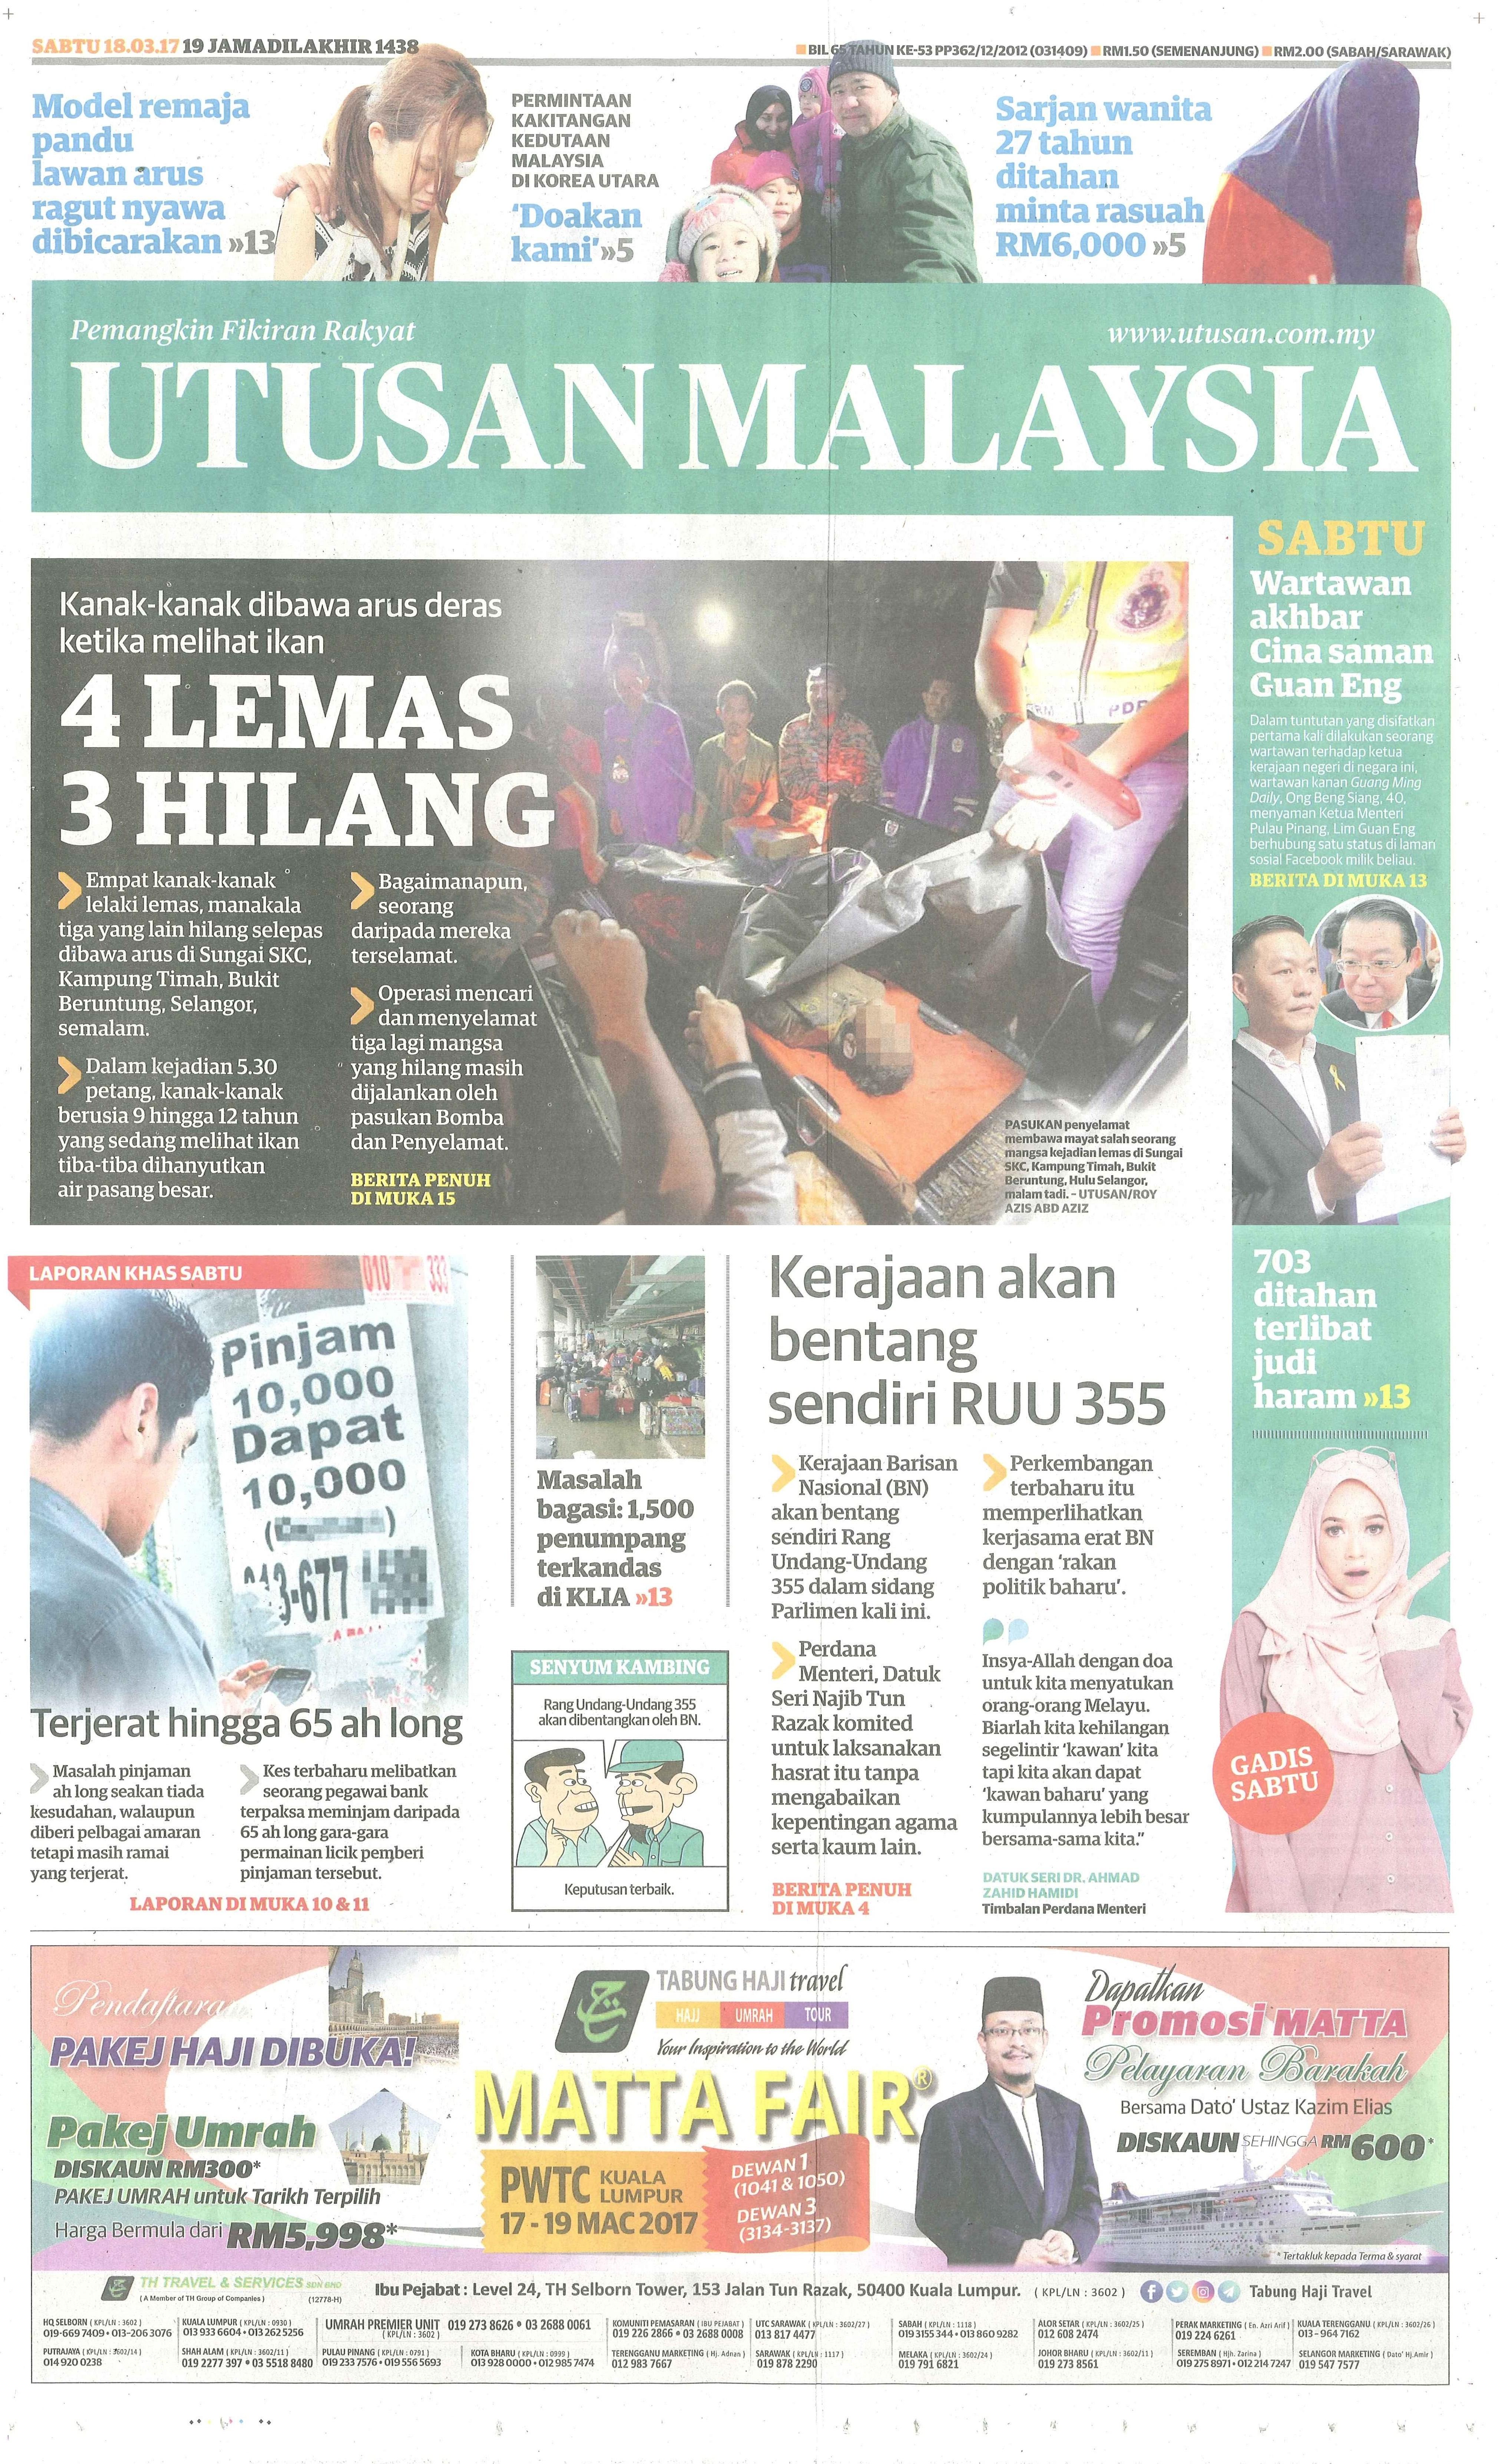 utusan malaysia 18.3.2017 1